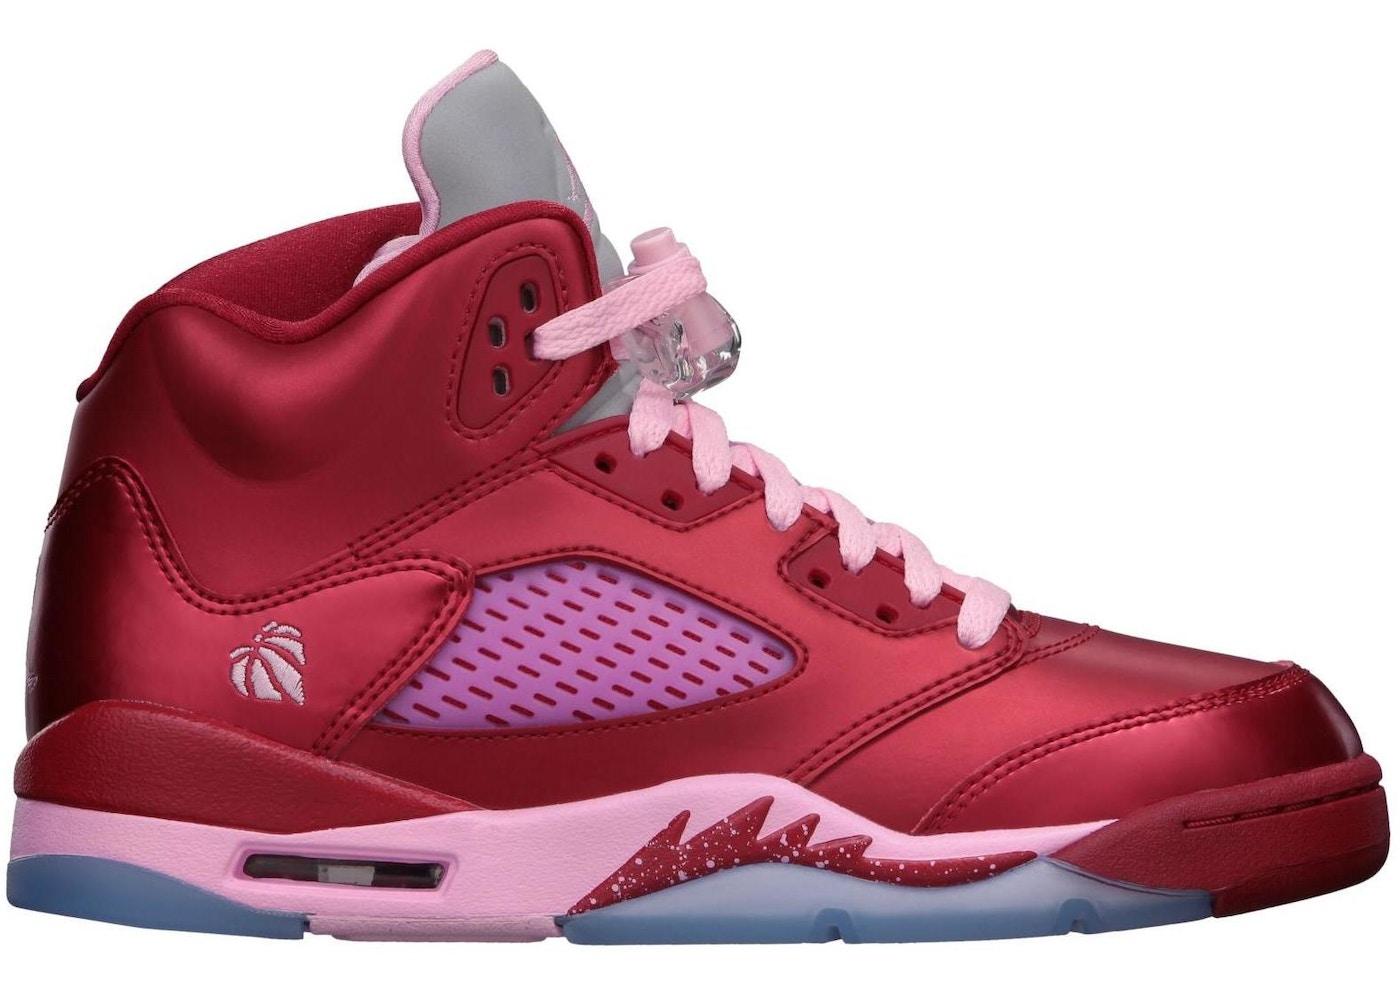 7a8dd14d54a6 HypeAnalyzer · Jordan 5 Retro Valentines Day (GS)